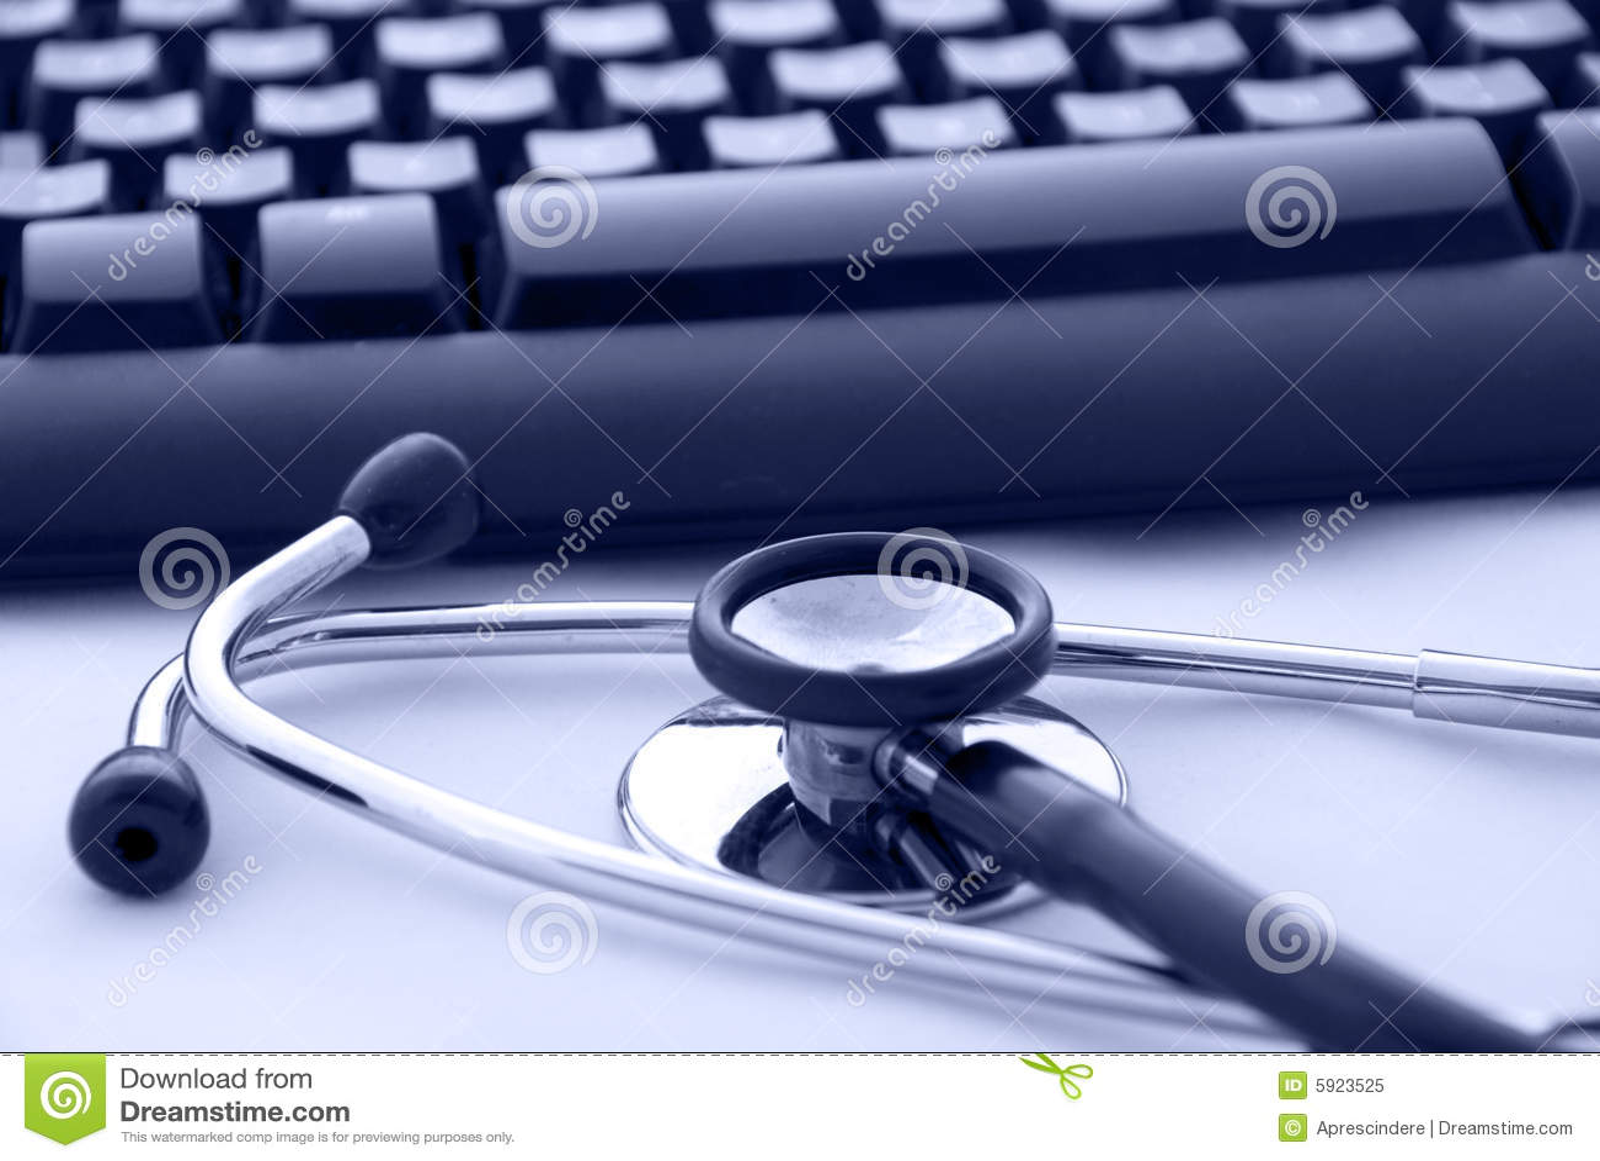 Klawiatury komputerowej stetoskop